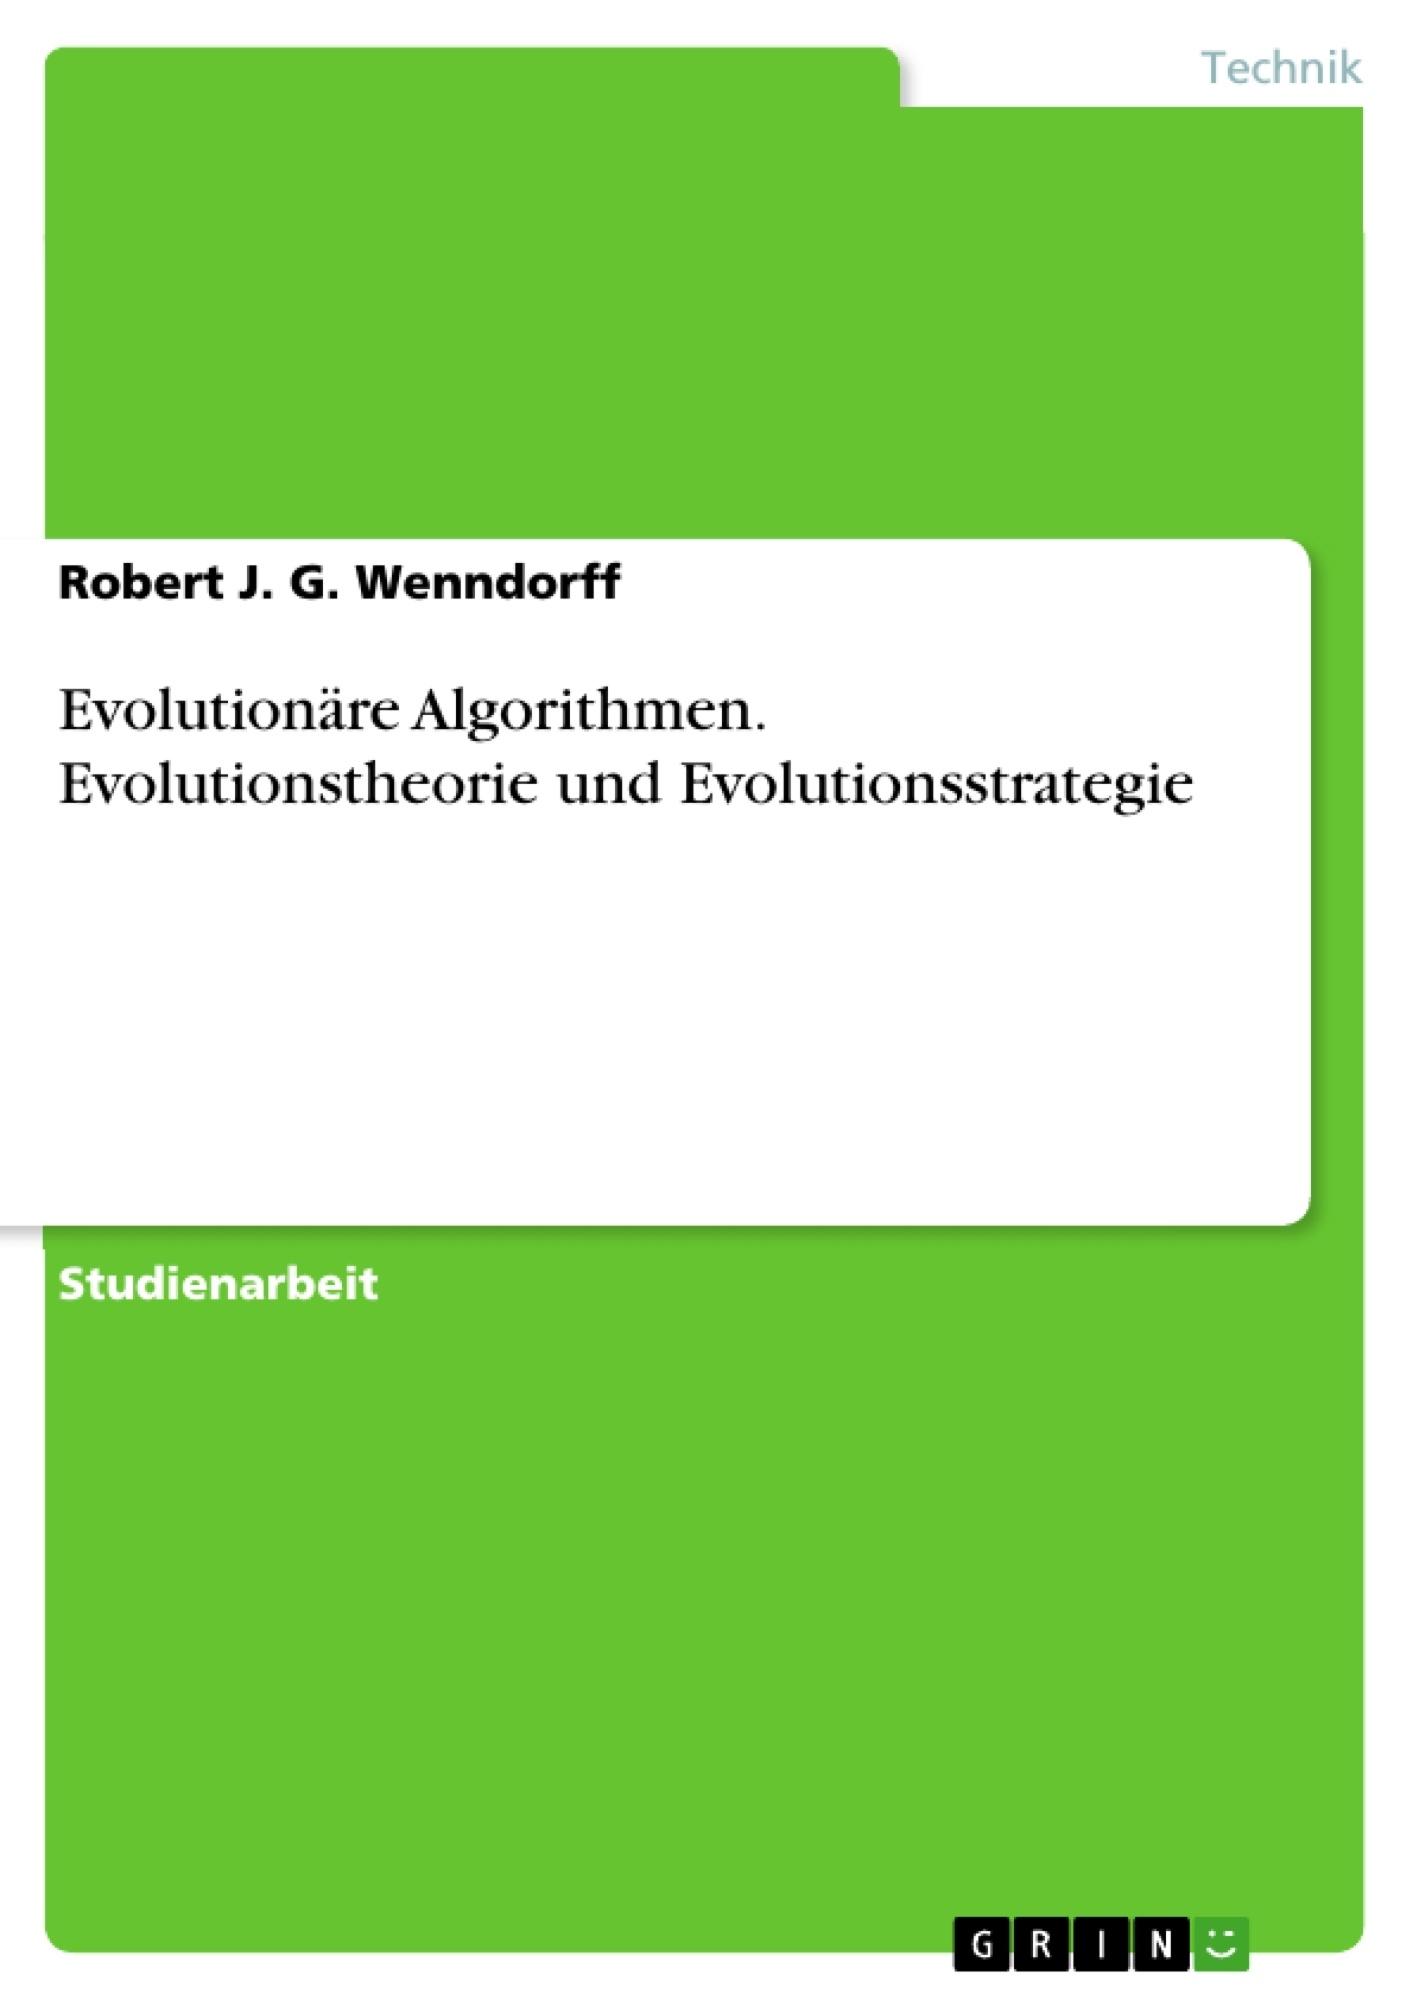 Titel: Evolutionäre Algorithmen. Evolutionstheorie und Evolutionsstrategie